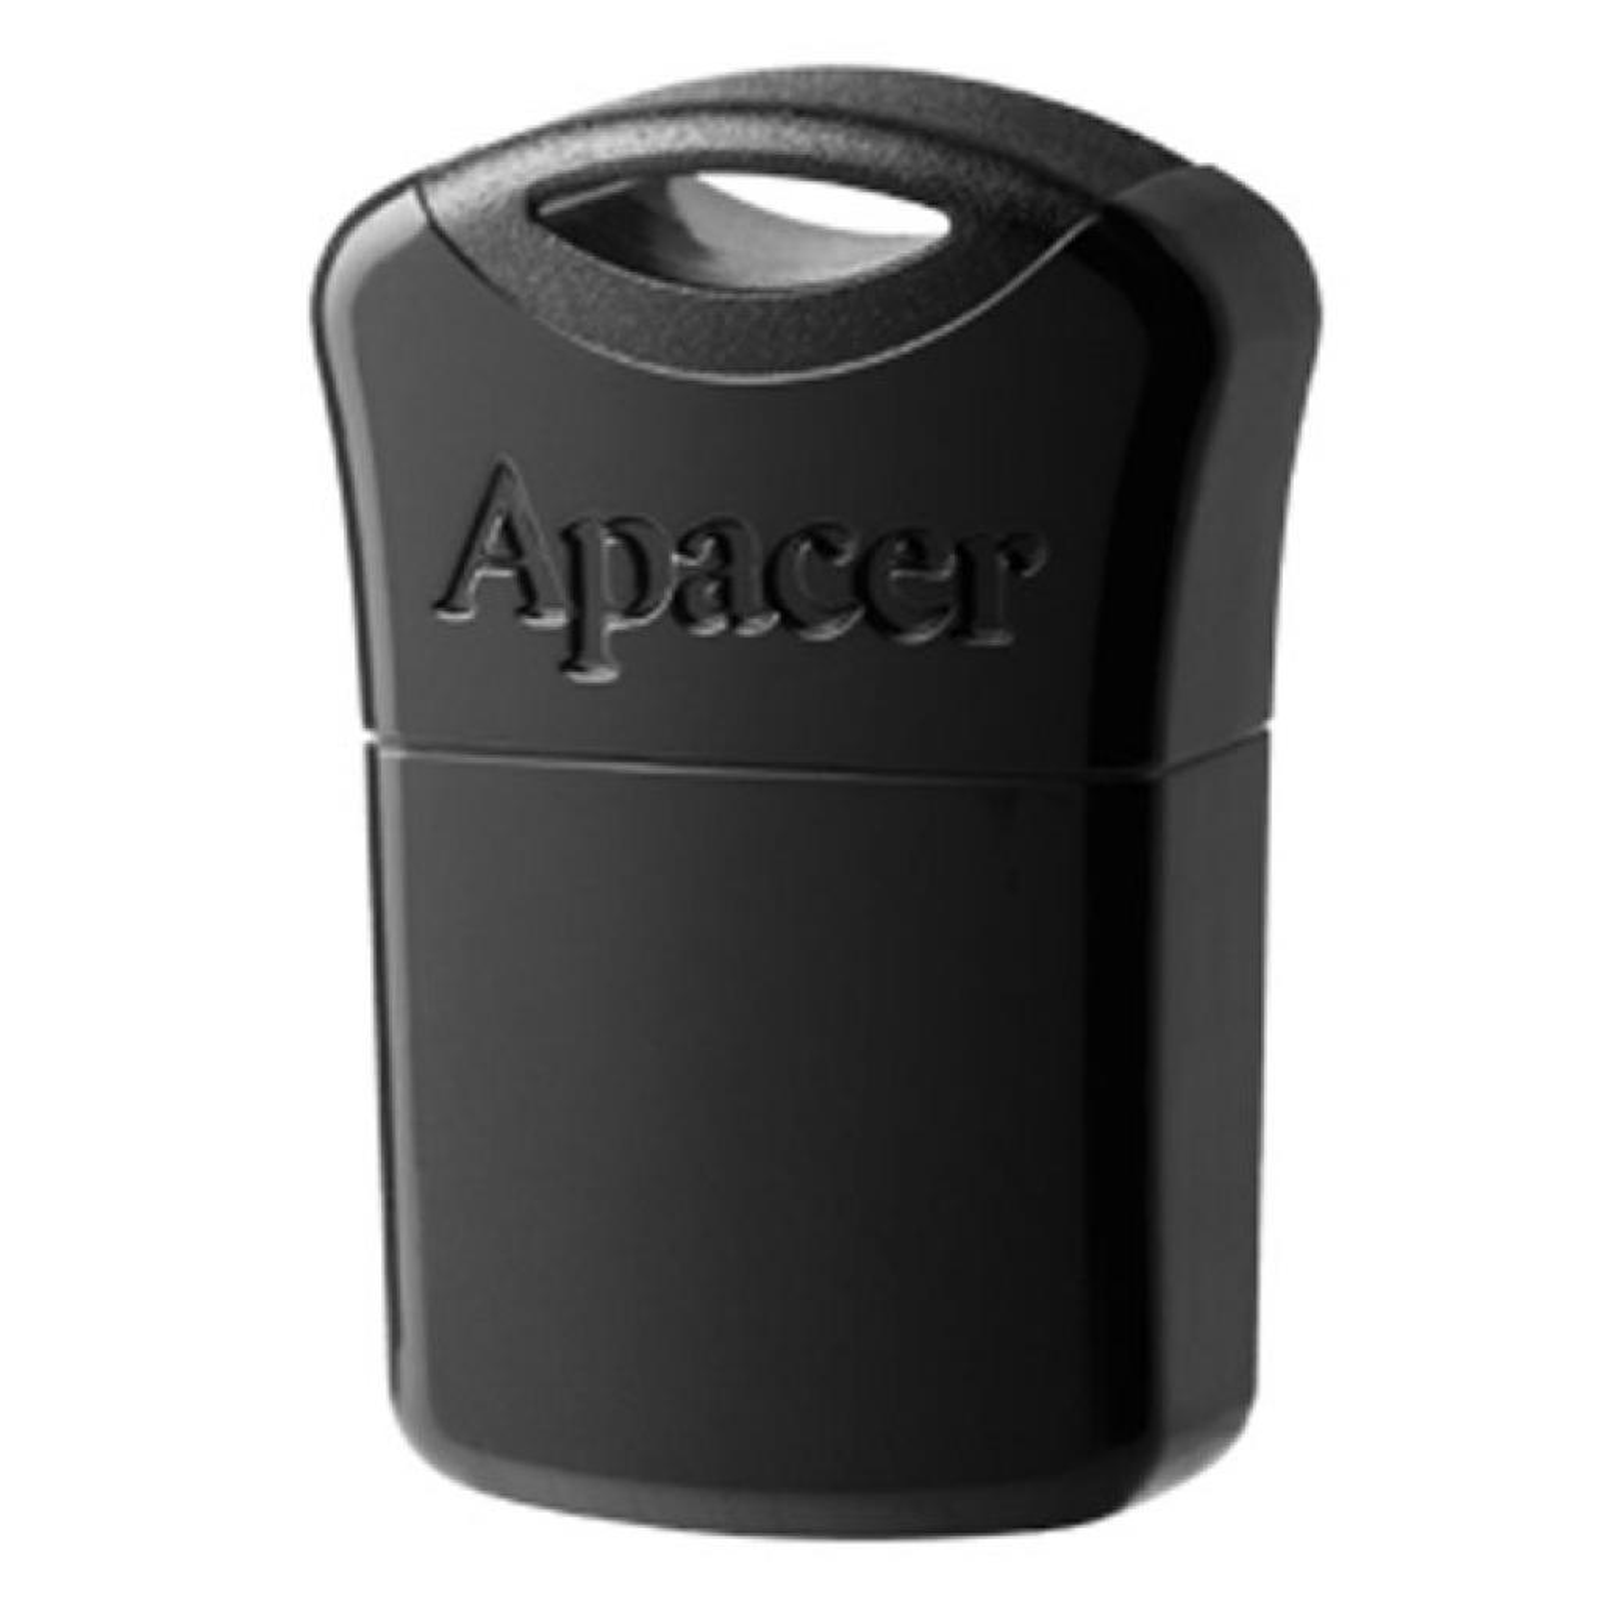 USB флеш накопитель Apacer 32GB AH116 Black USB 2.0 (AP32GAH116B-1)